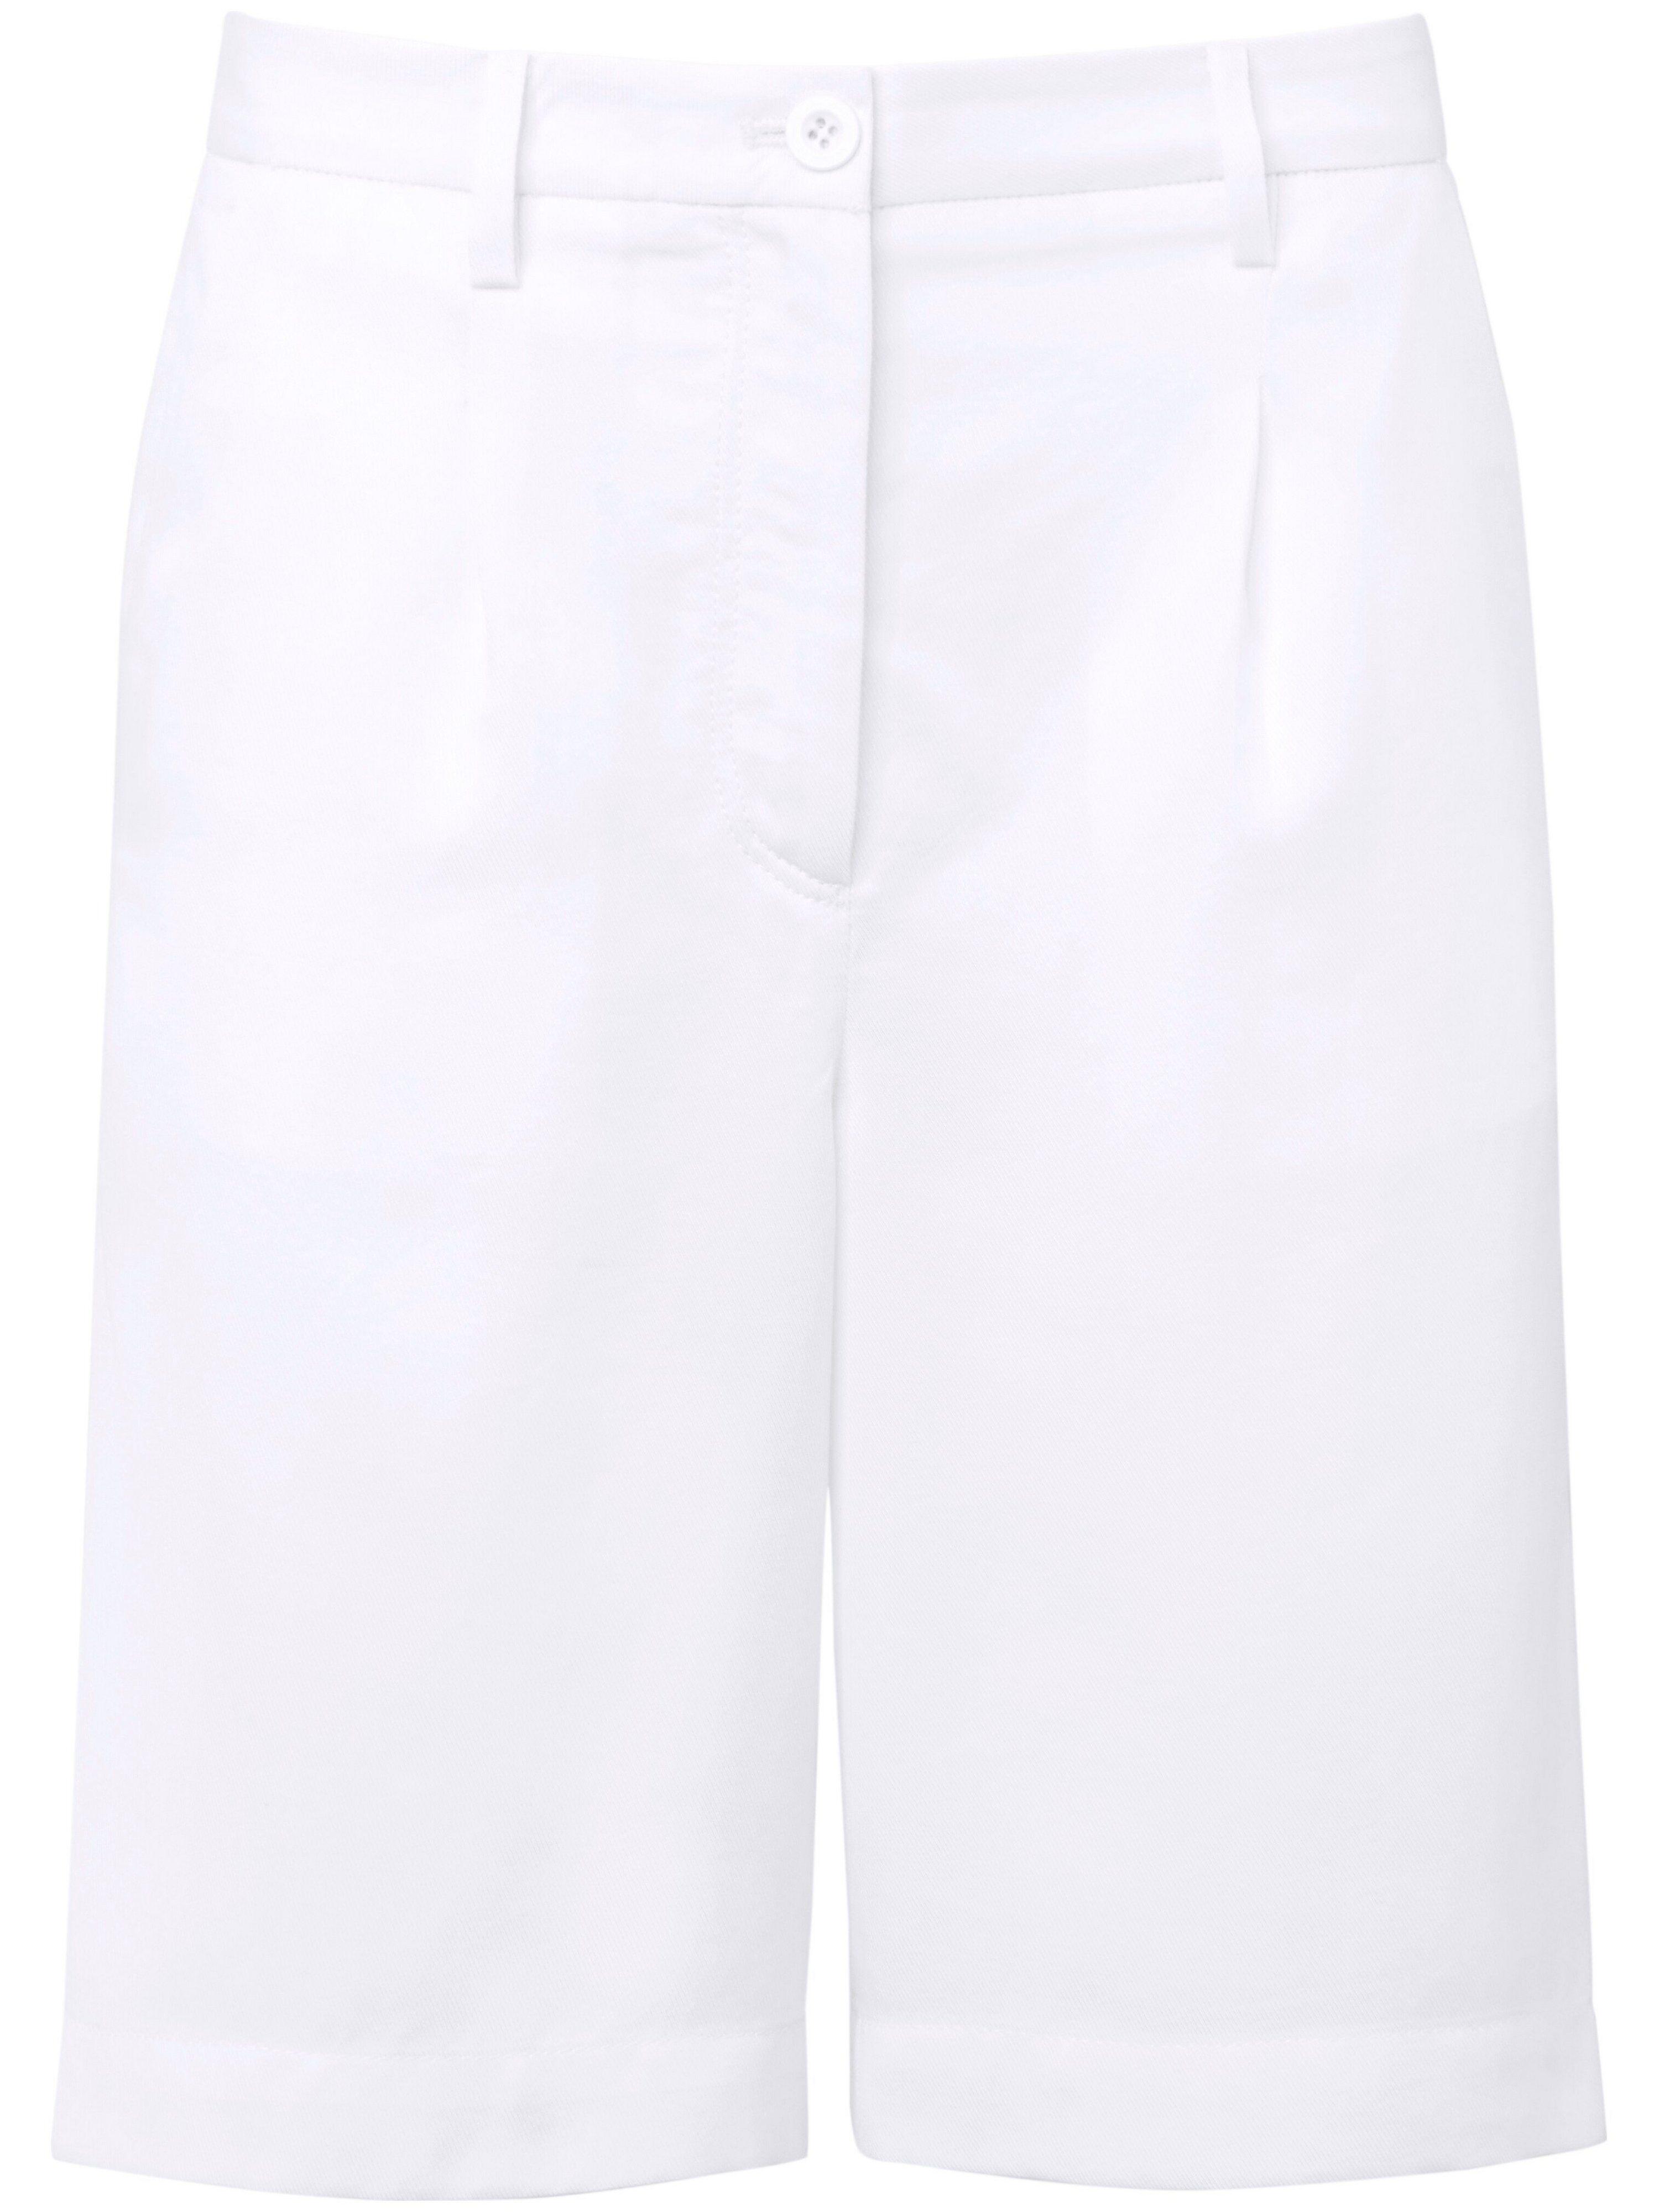 DAY.LIKE Le short citadin à pinces  DAY.LIKE blanc  - Femme - 38